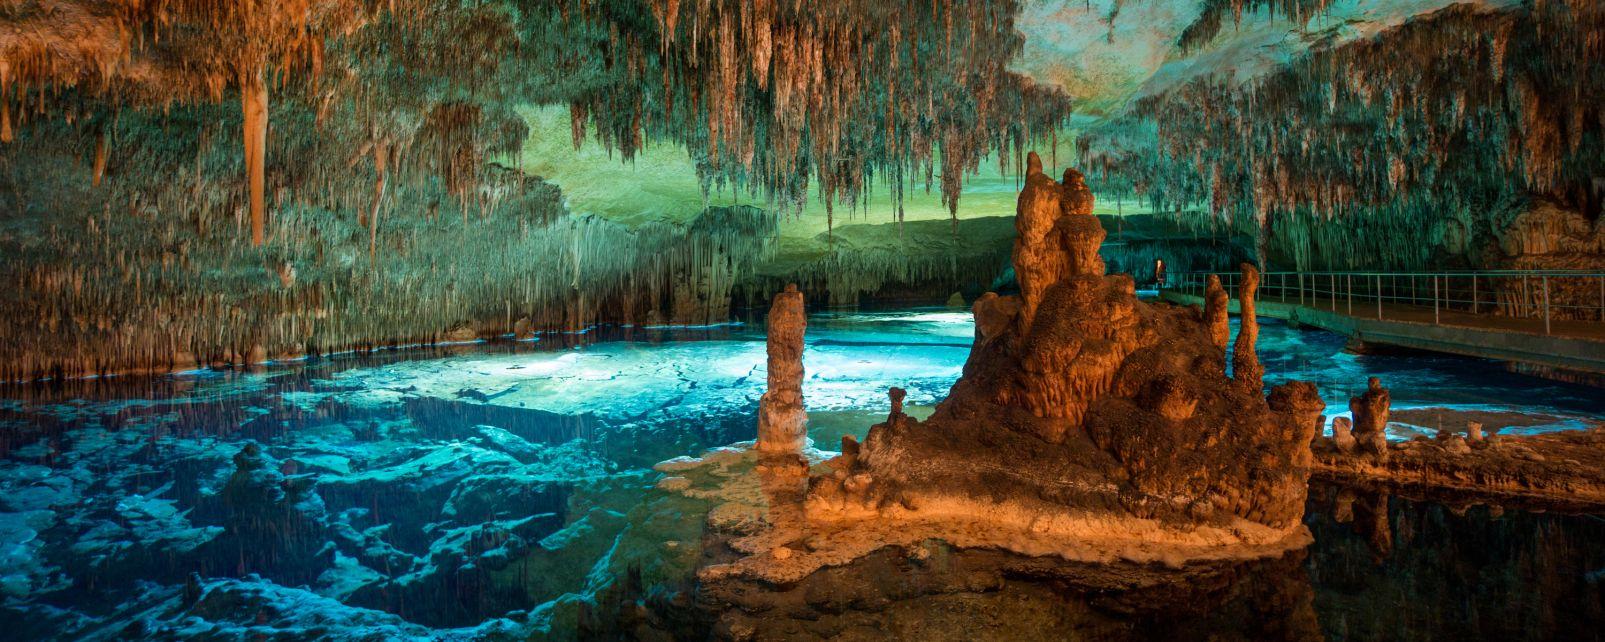 Grotte di Maiorca, Le grotte di Maiorca, I paesaggi, Baleari